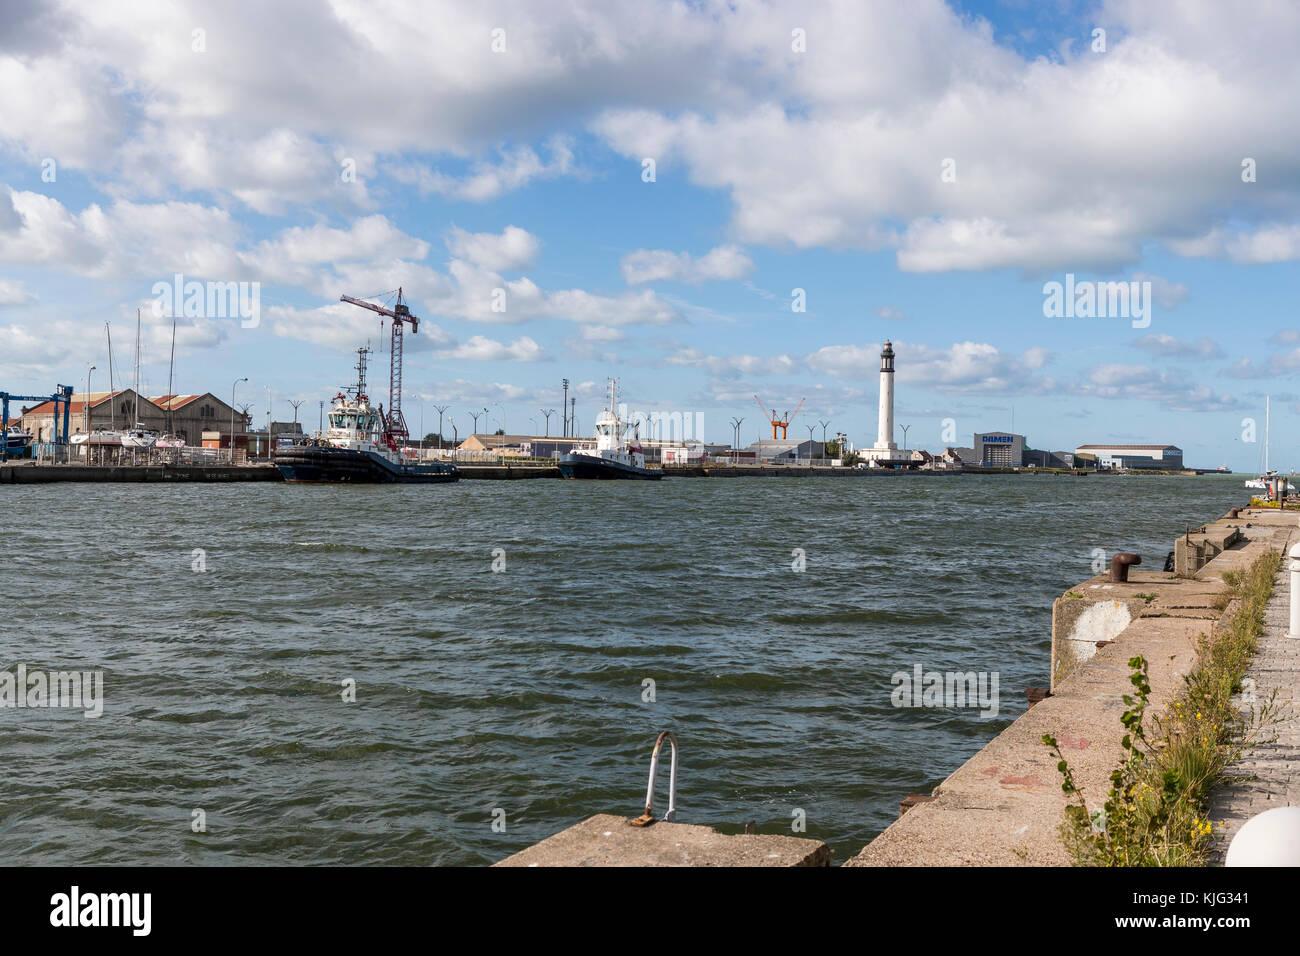 Dunkirk evacuation ship stock photos dunkirk evacuation ship stock images alamy - Dunkirk port france address ...